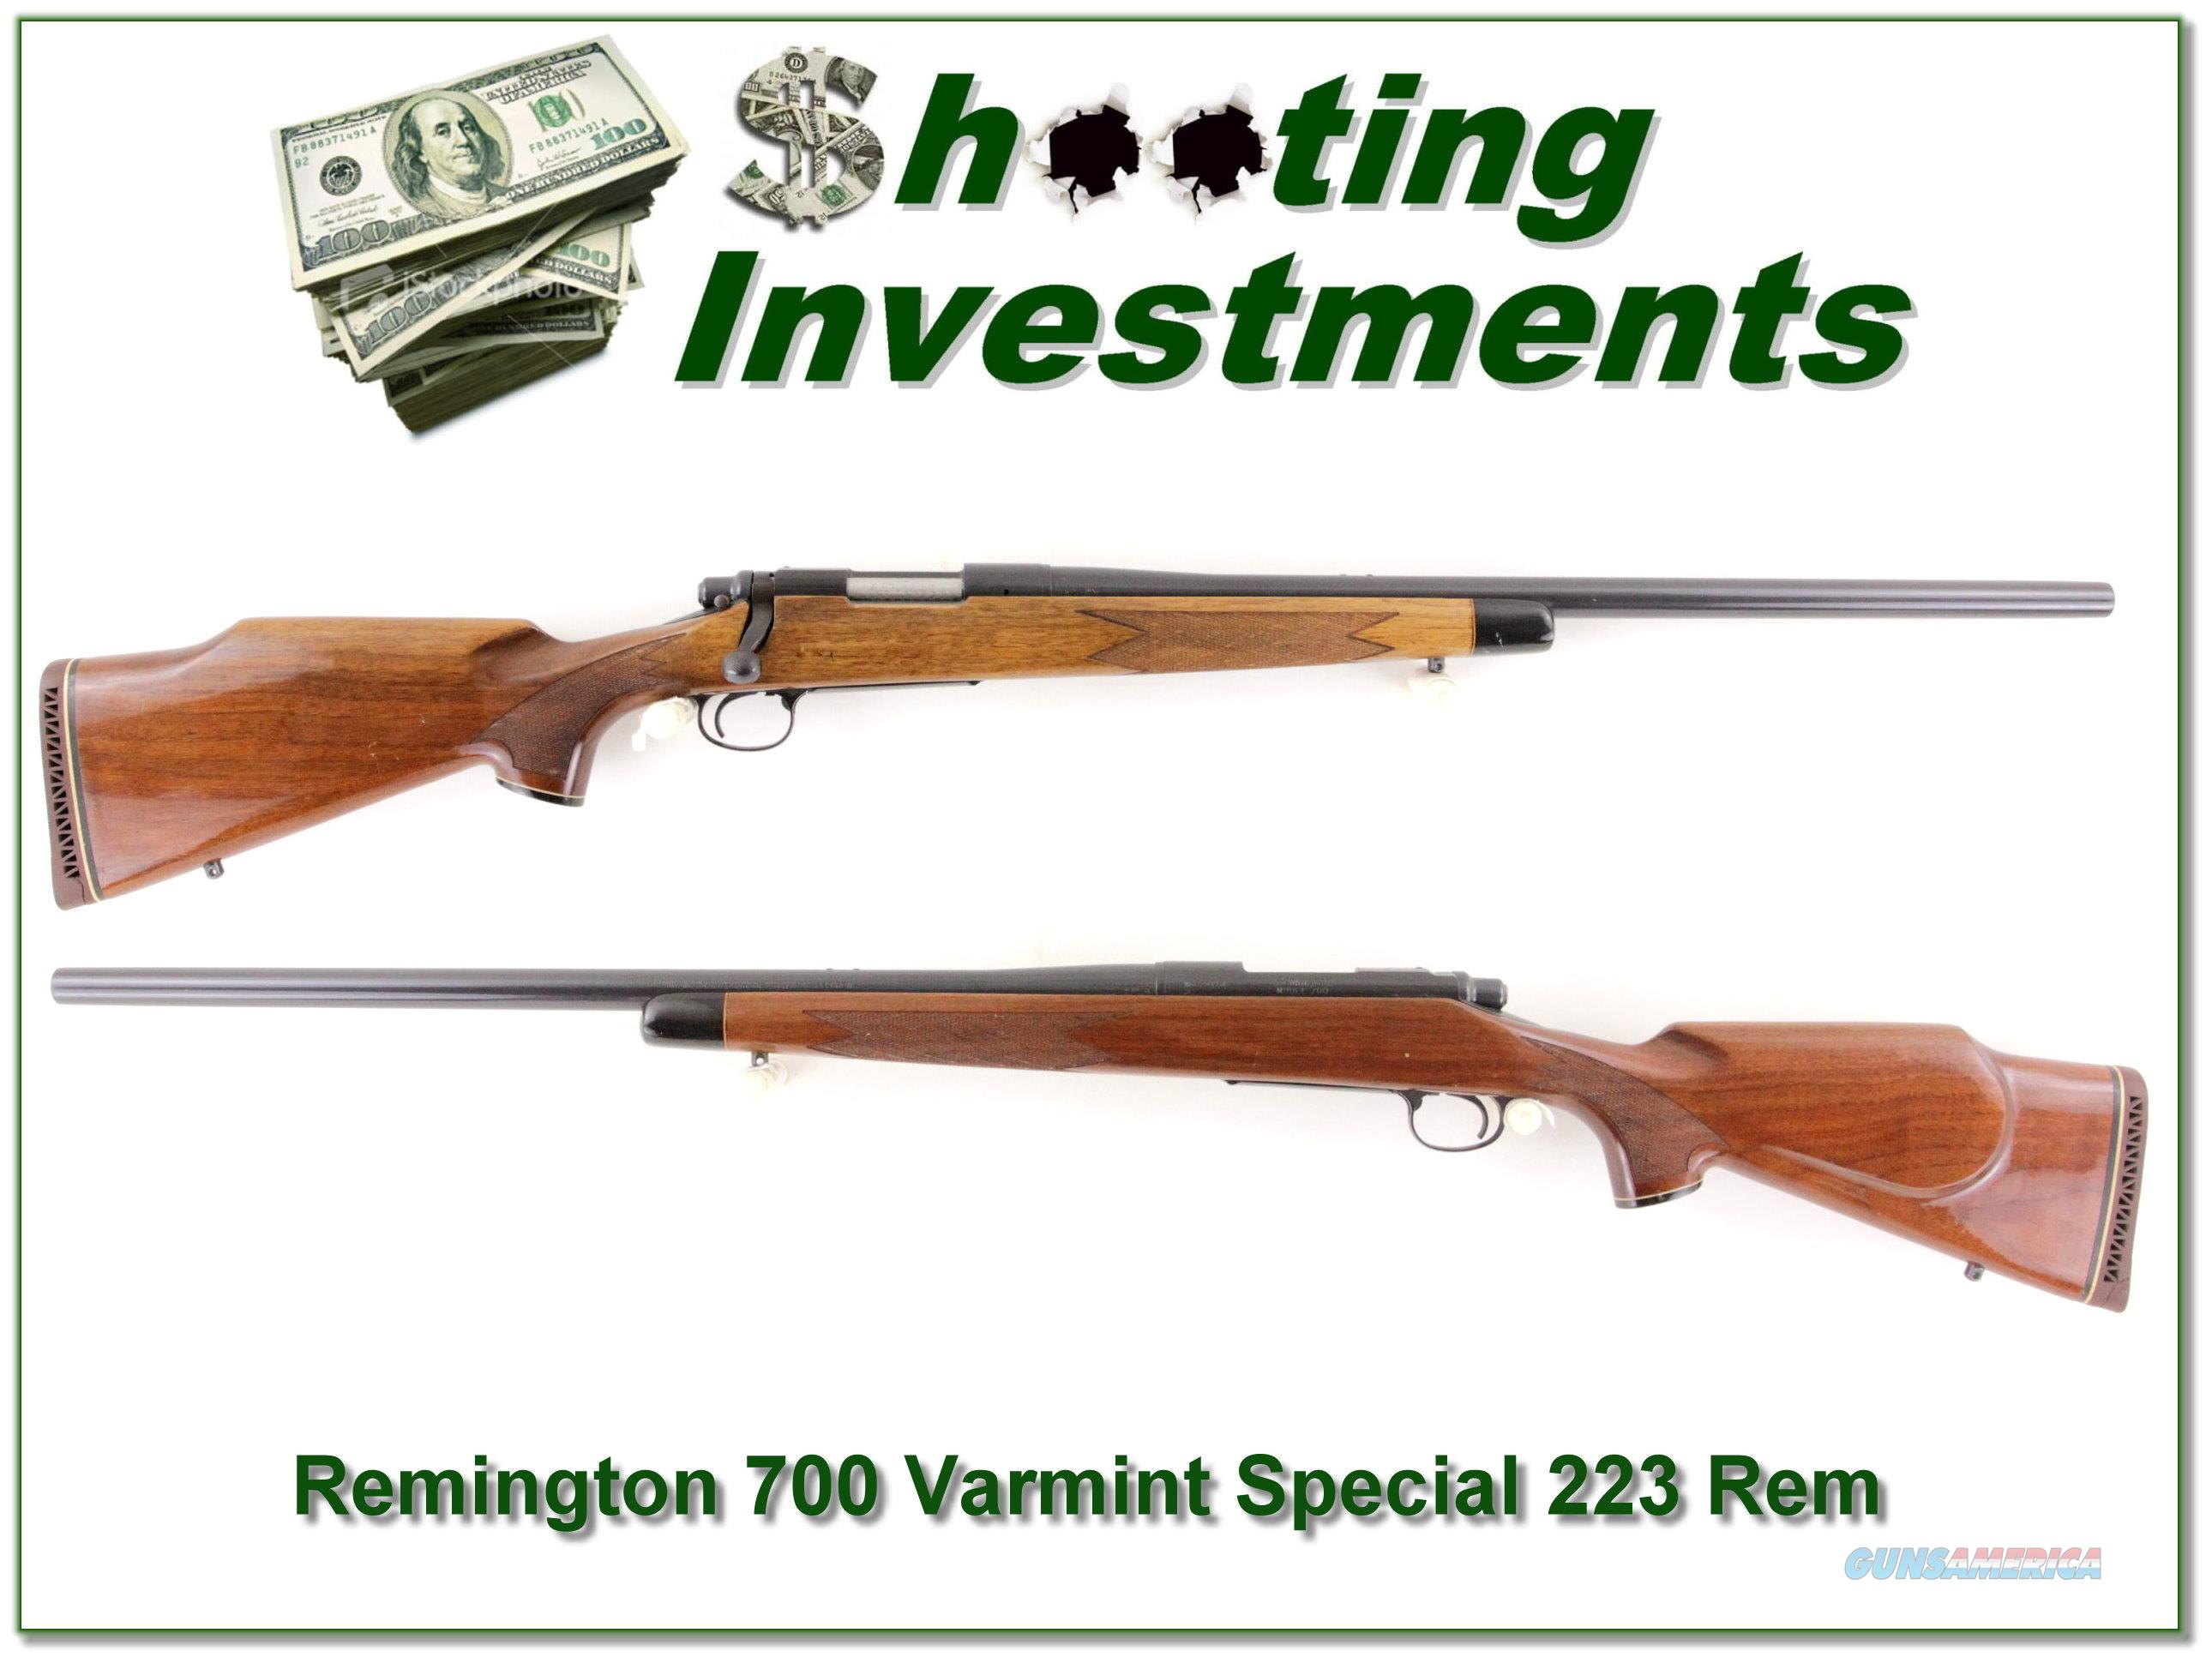 Remington 700 Varmint Special 223 Rem Heavy Barrel  Guns > Rifles > Remington Rifles - Modern > Model 700 > Sporting